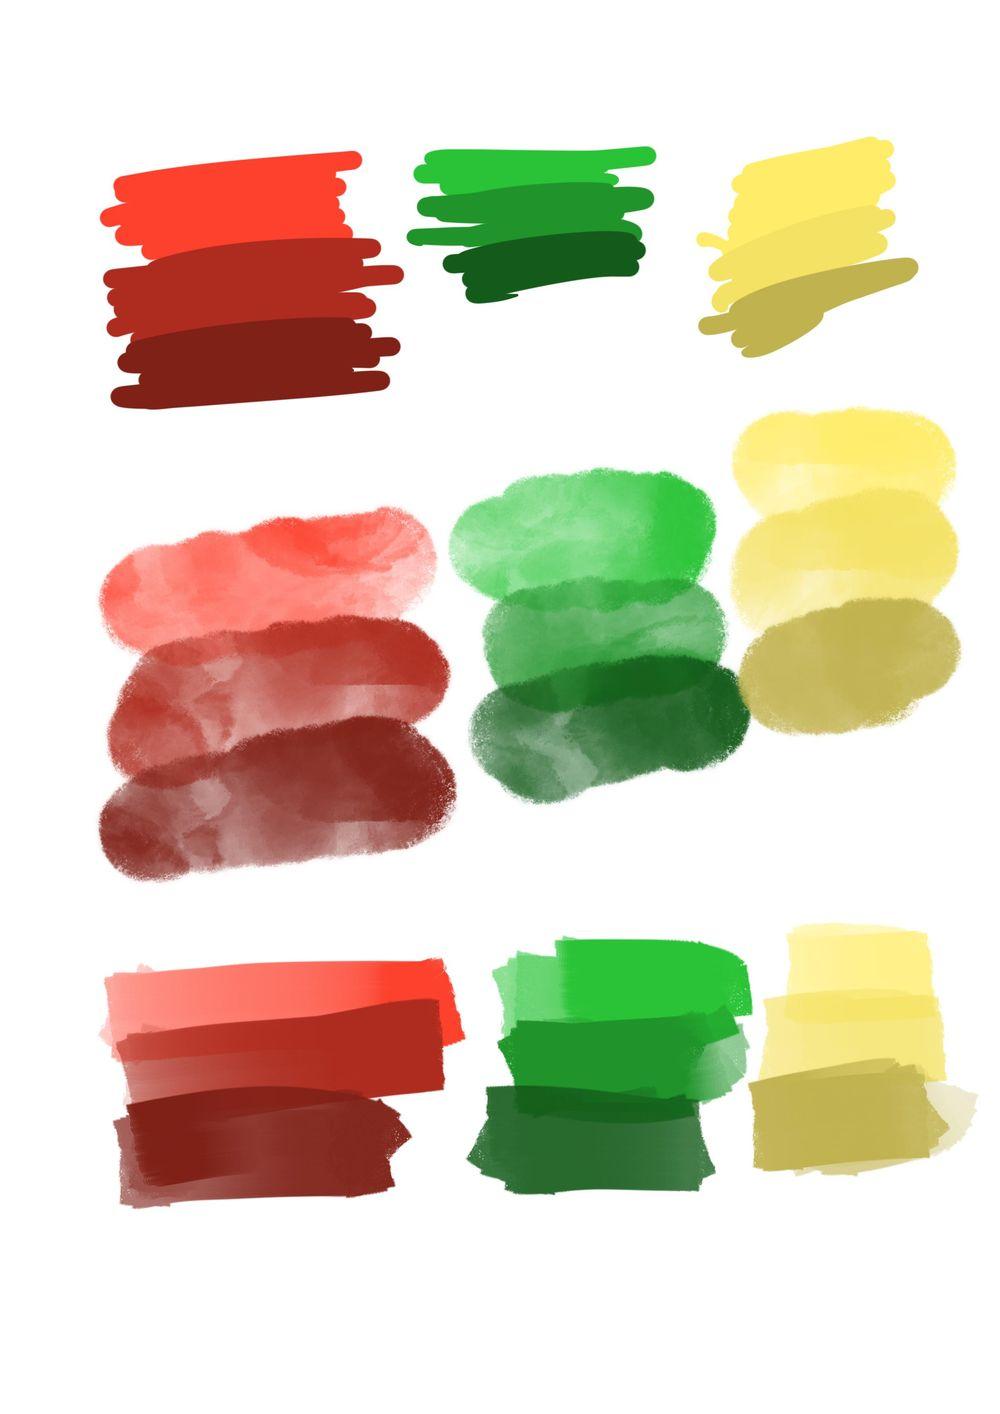 Color palettes - image 1 - student project